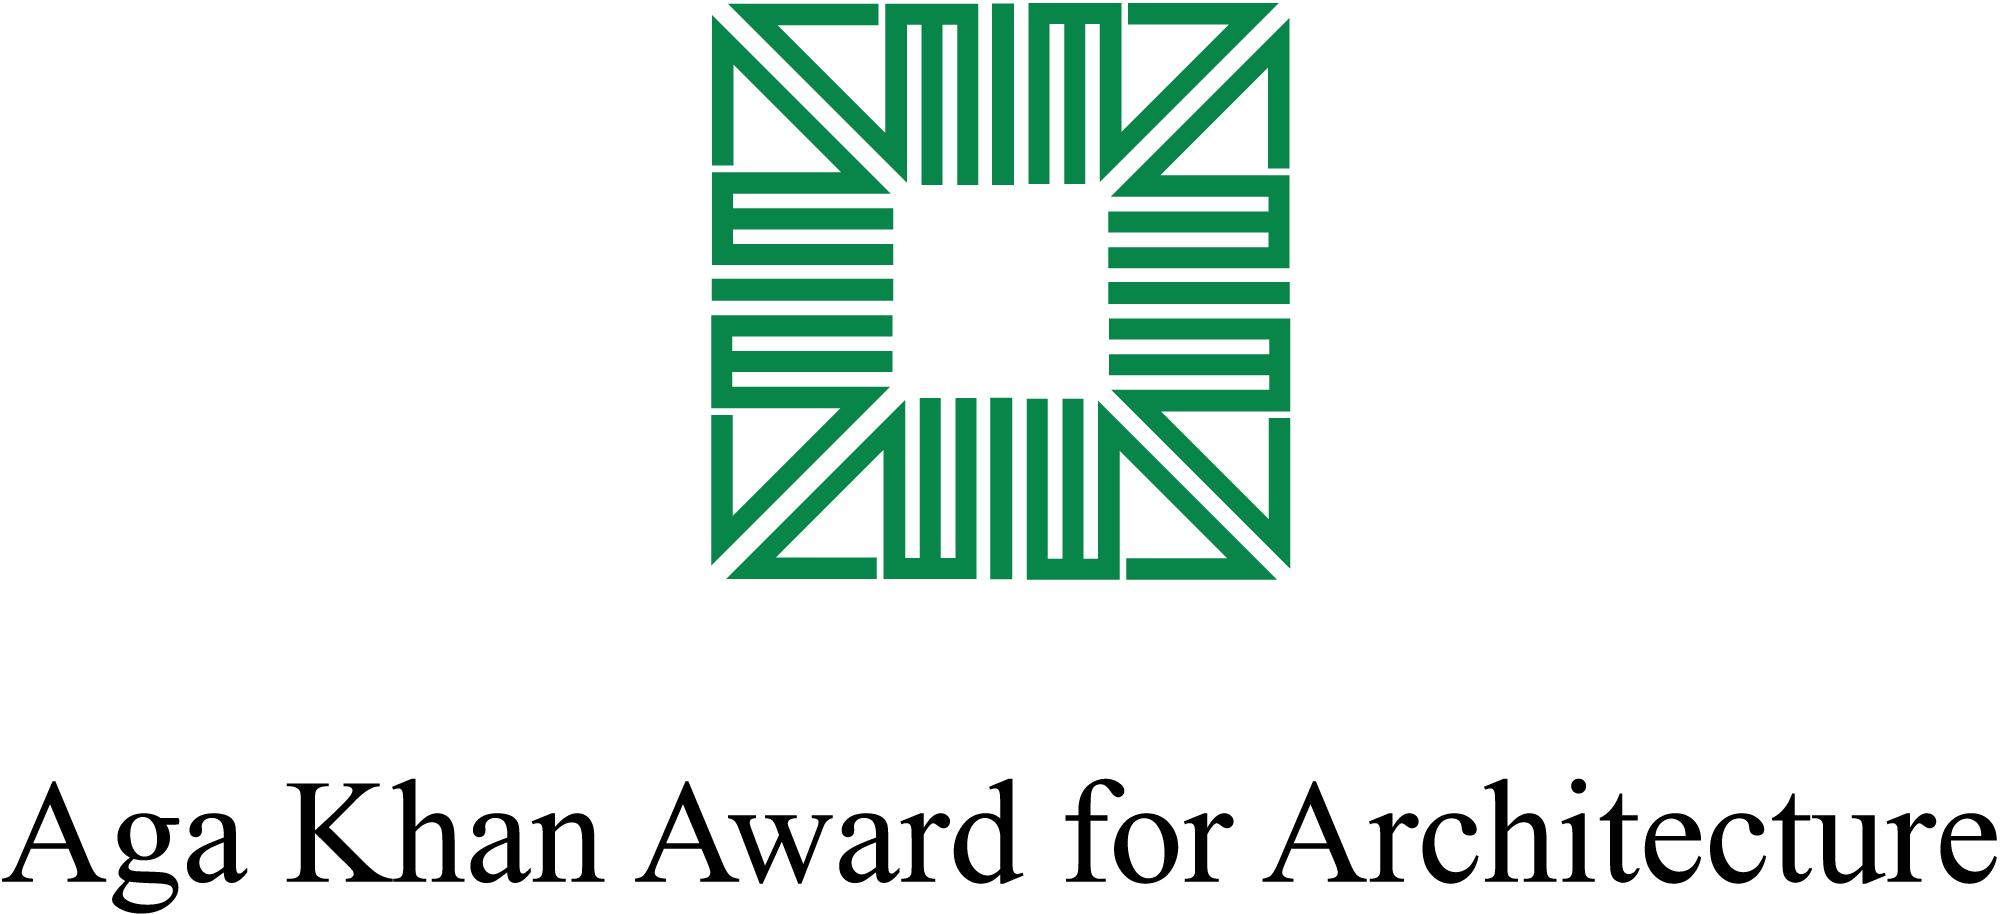 AKAA-Logo